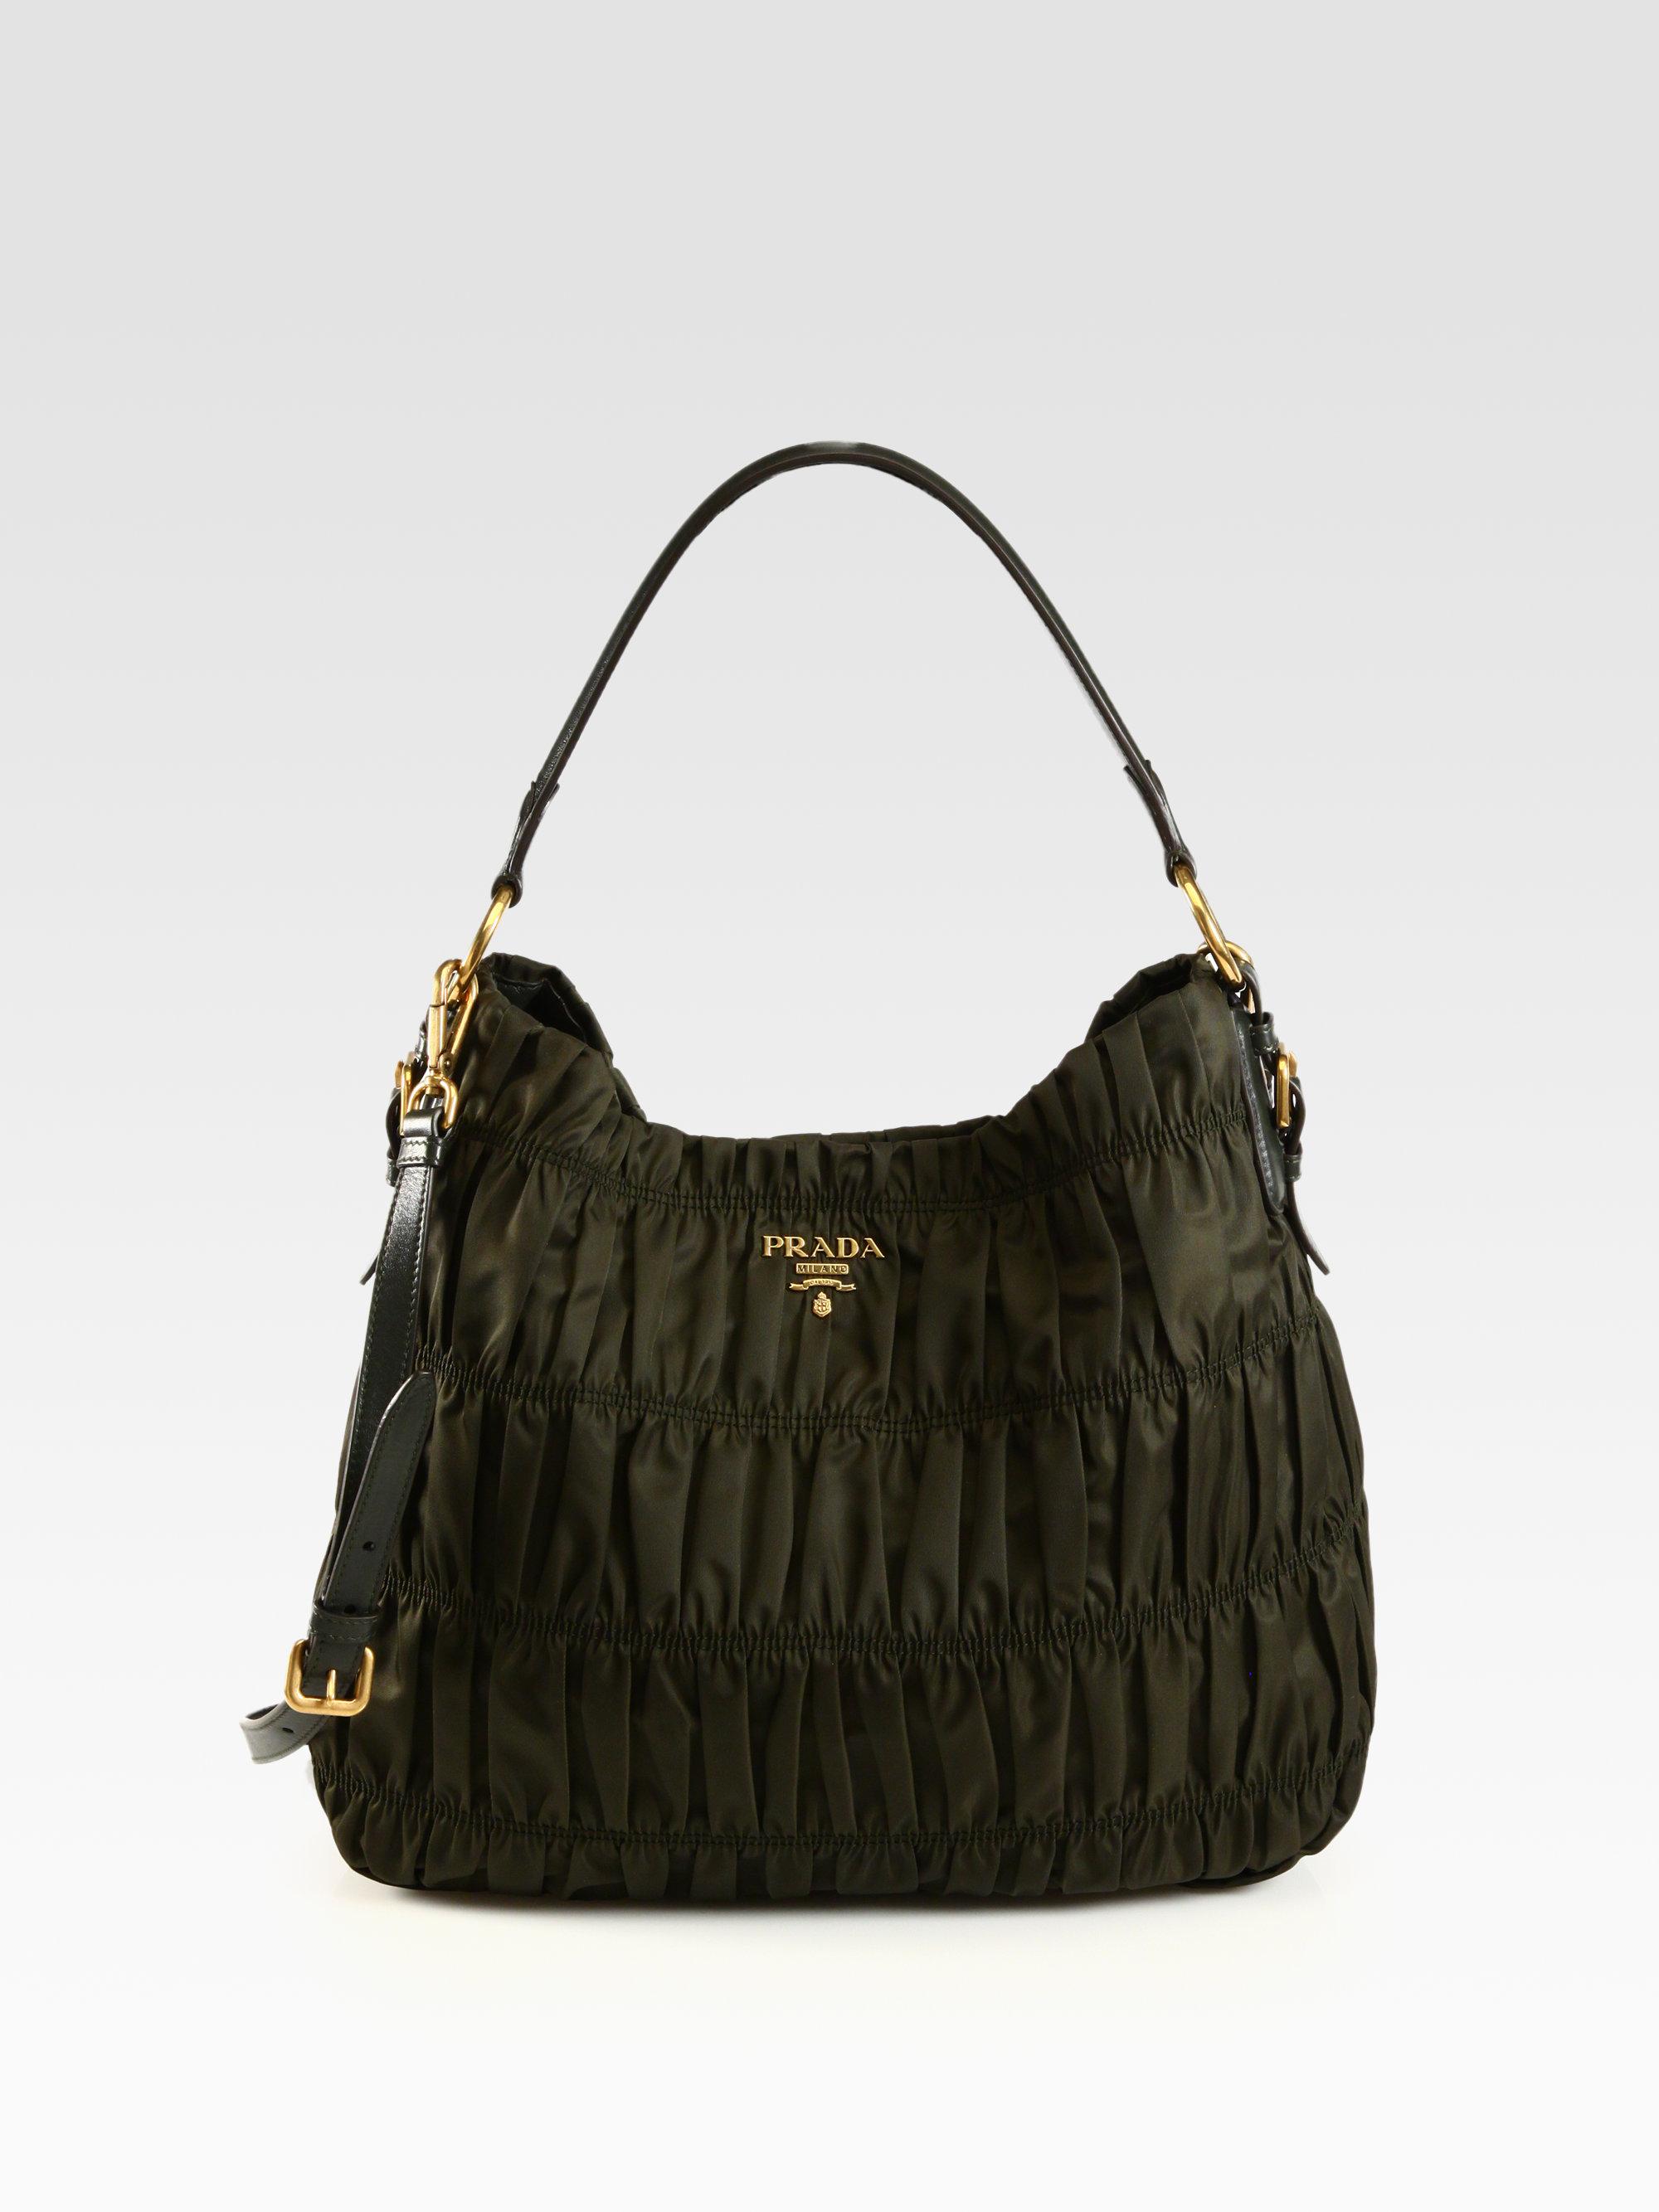 ... tote bag luxury bags wallets handbags on carousell 6f01e 0905e  where  to buy lyst prada tessuto gaufre ruched nylon hobo in green b5b11 5bcbd c3eb9fa26bfe3